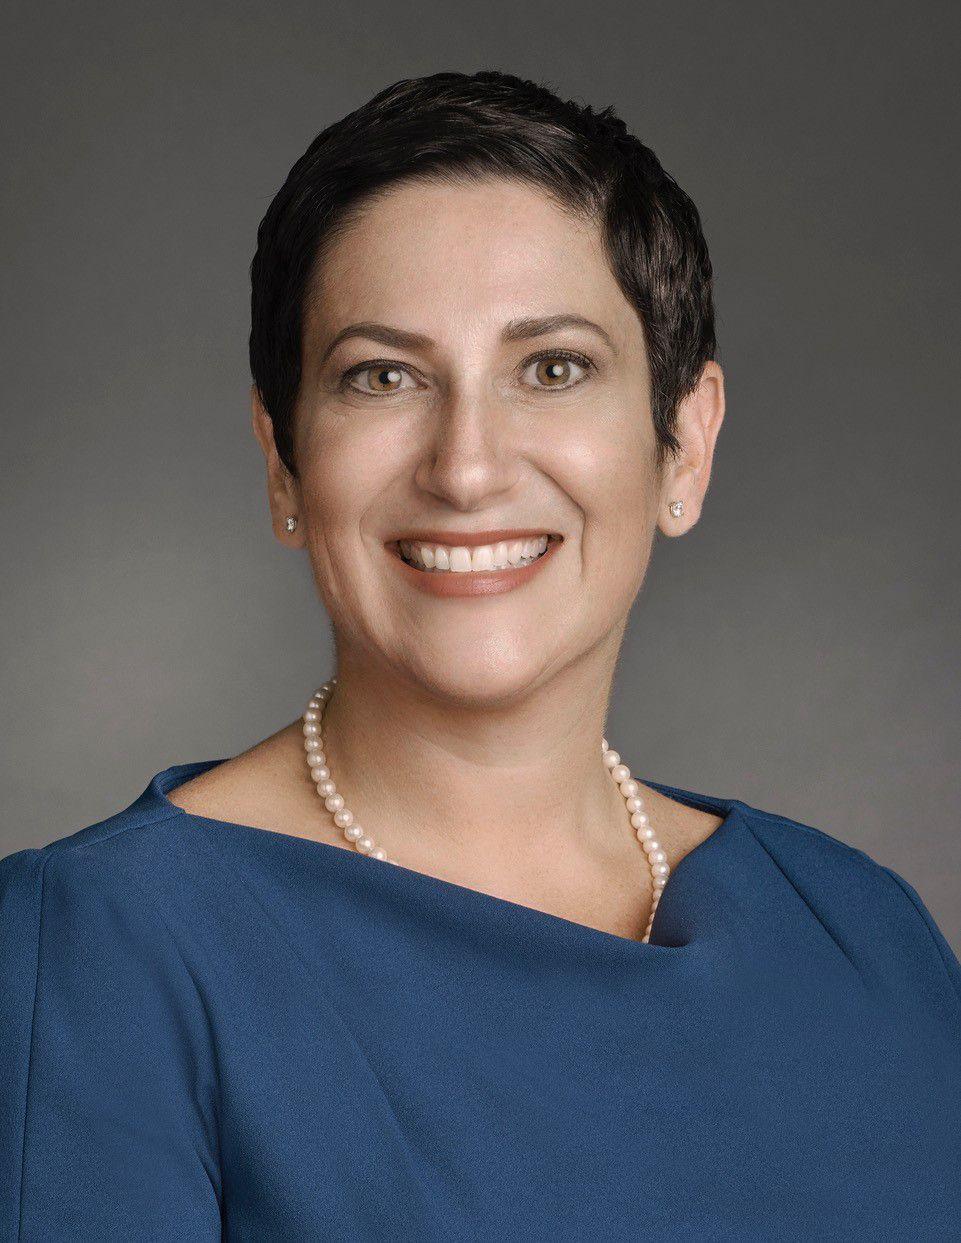 Melissa Zak is chief nursing officer at Virtua Memorial and Willingboro hospitals.